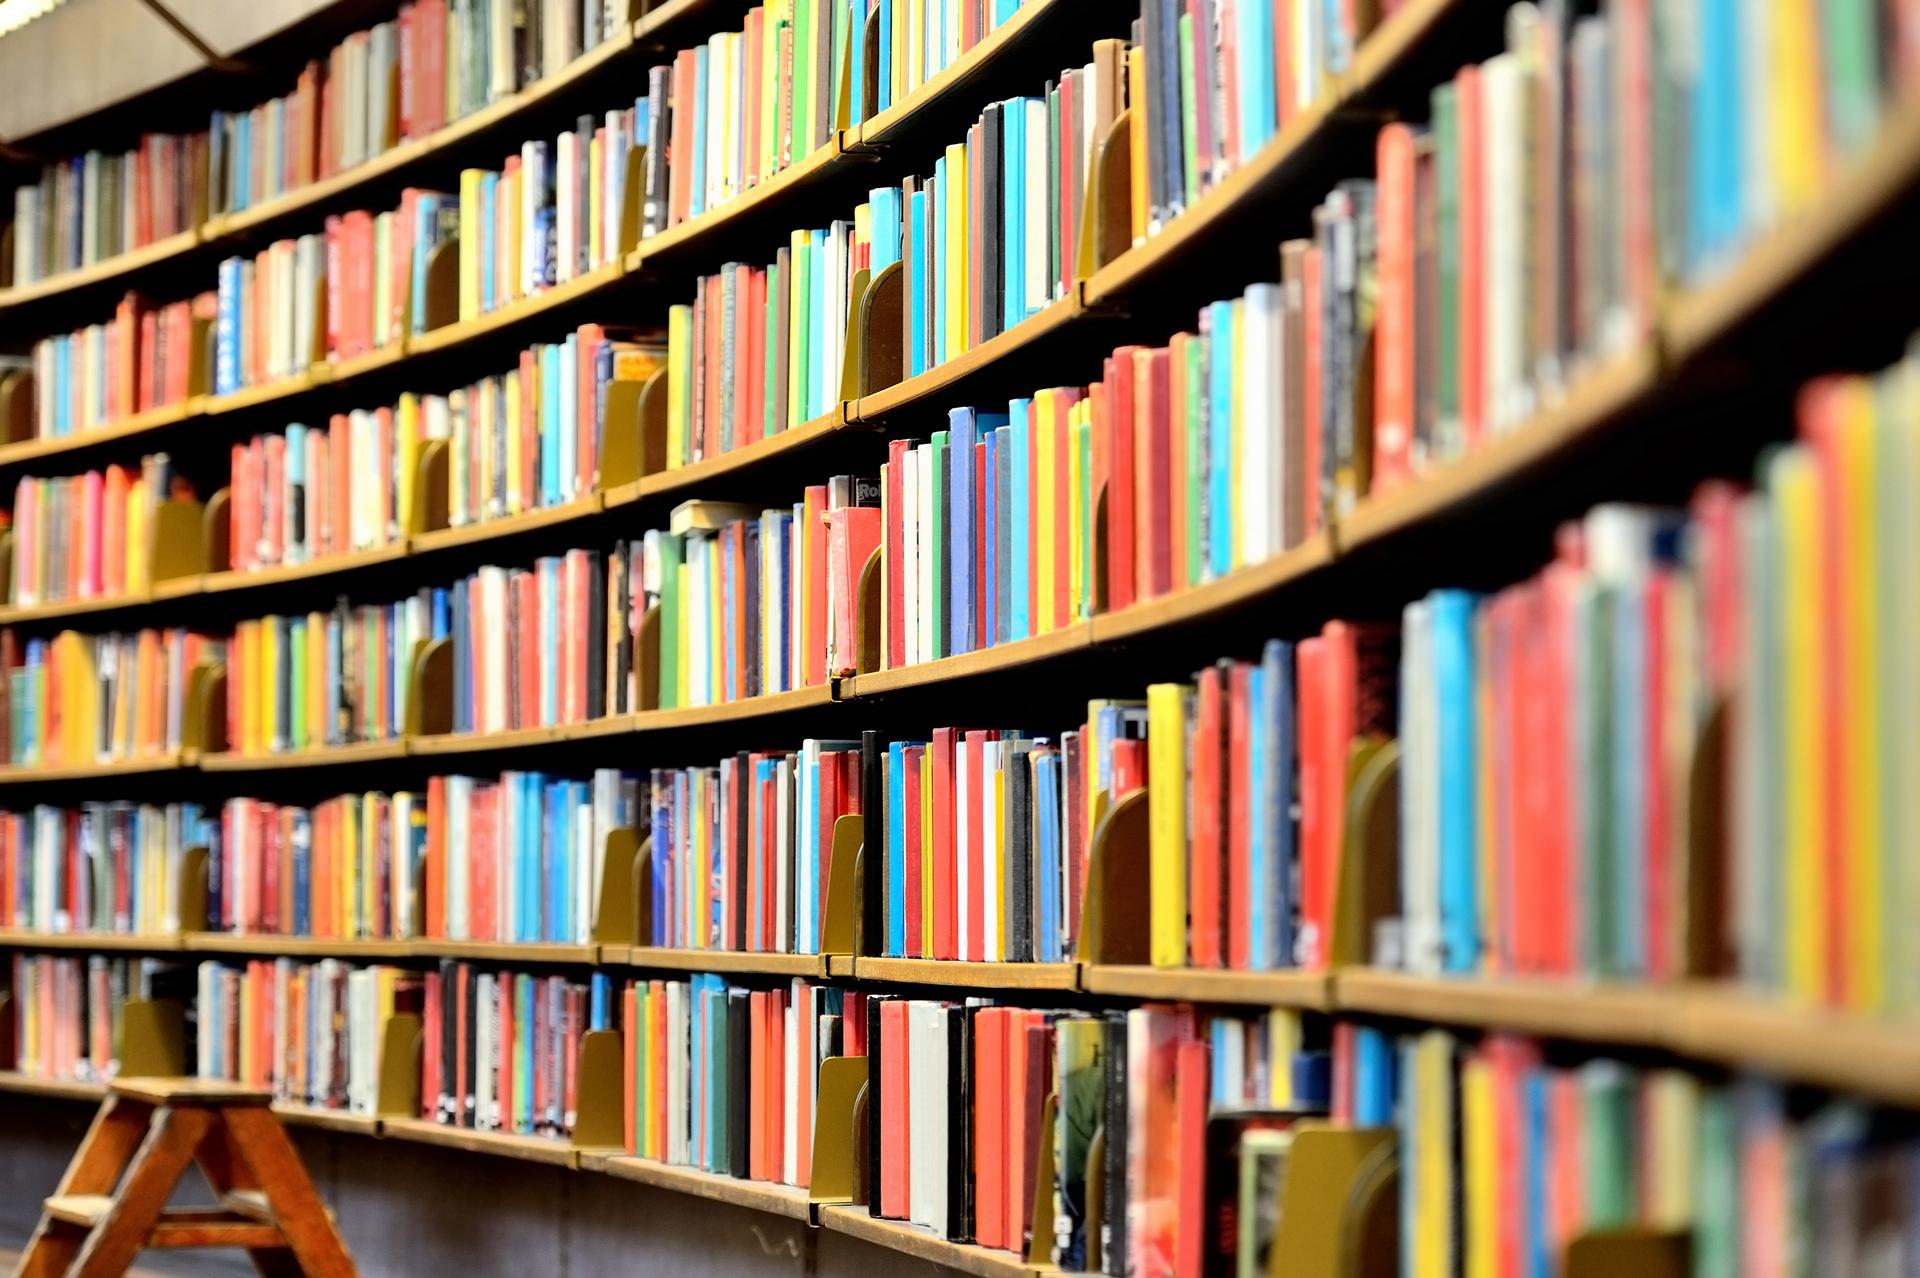 libraries wallpaper